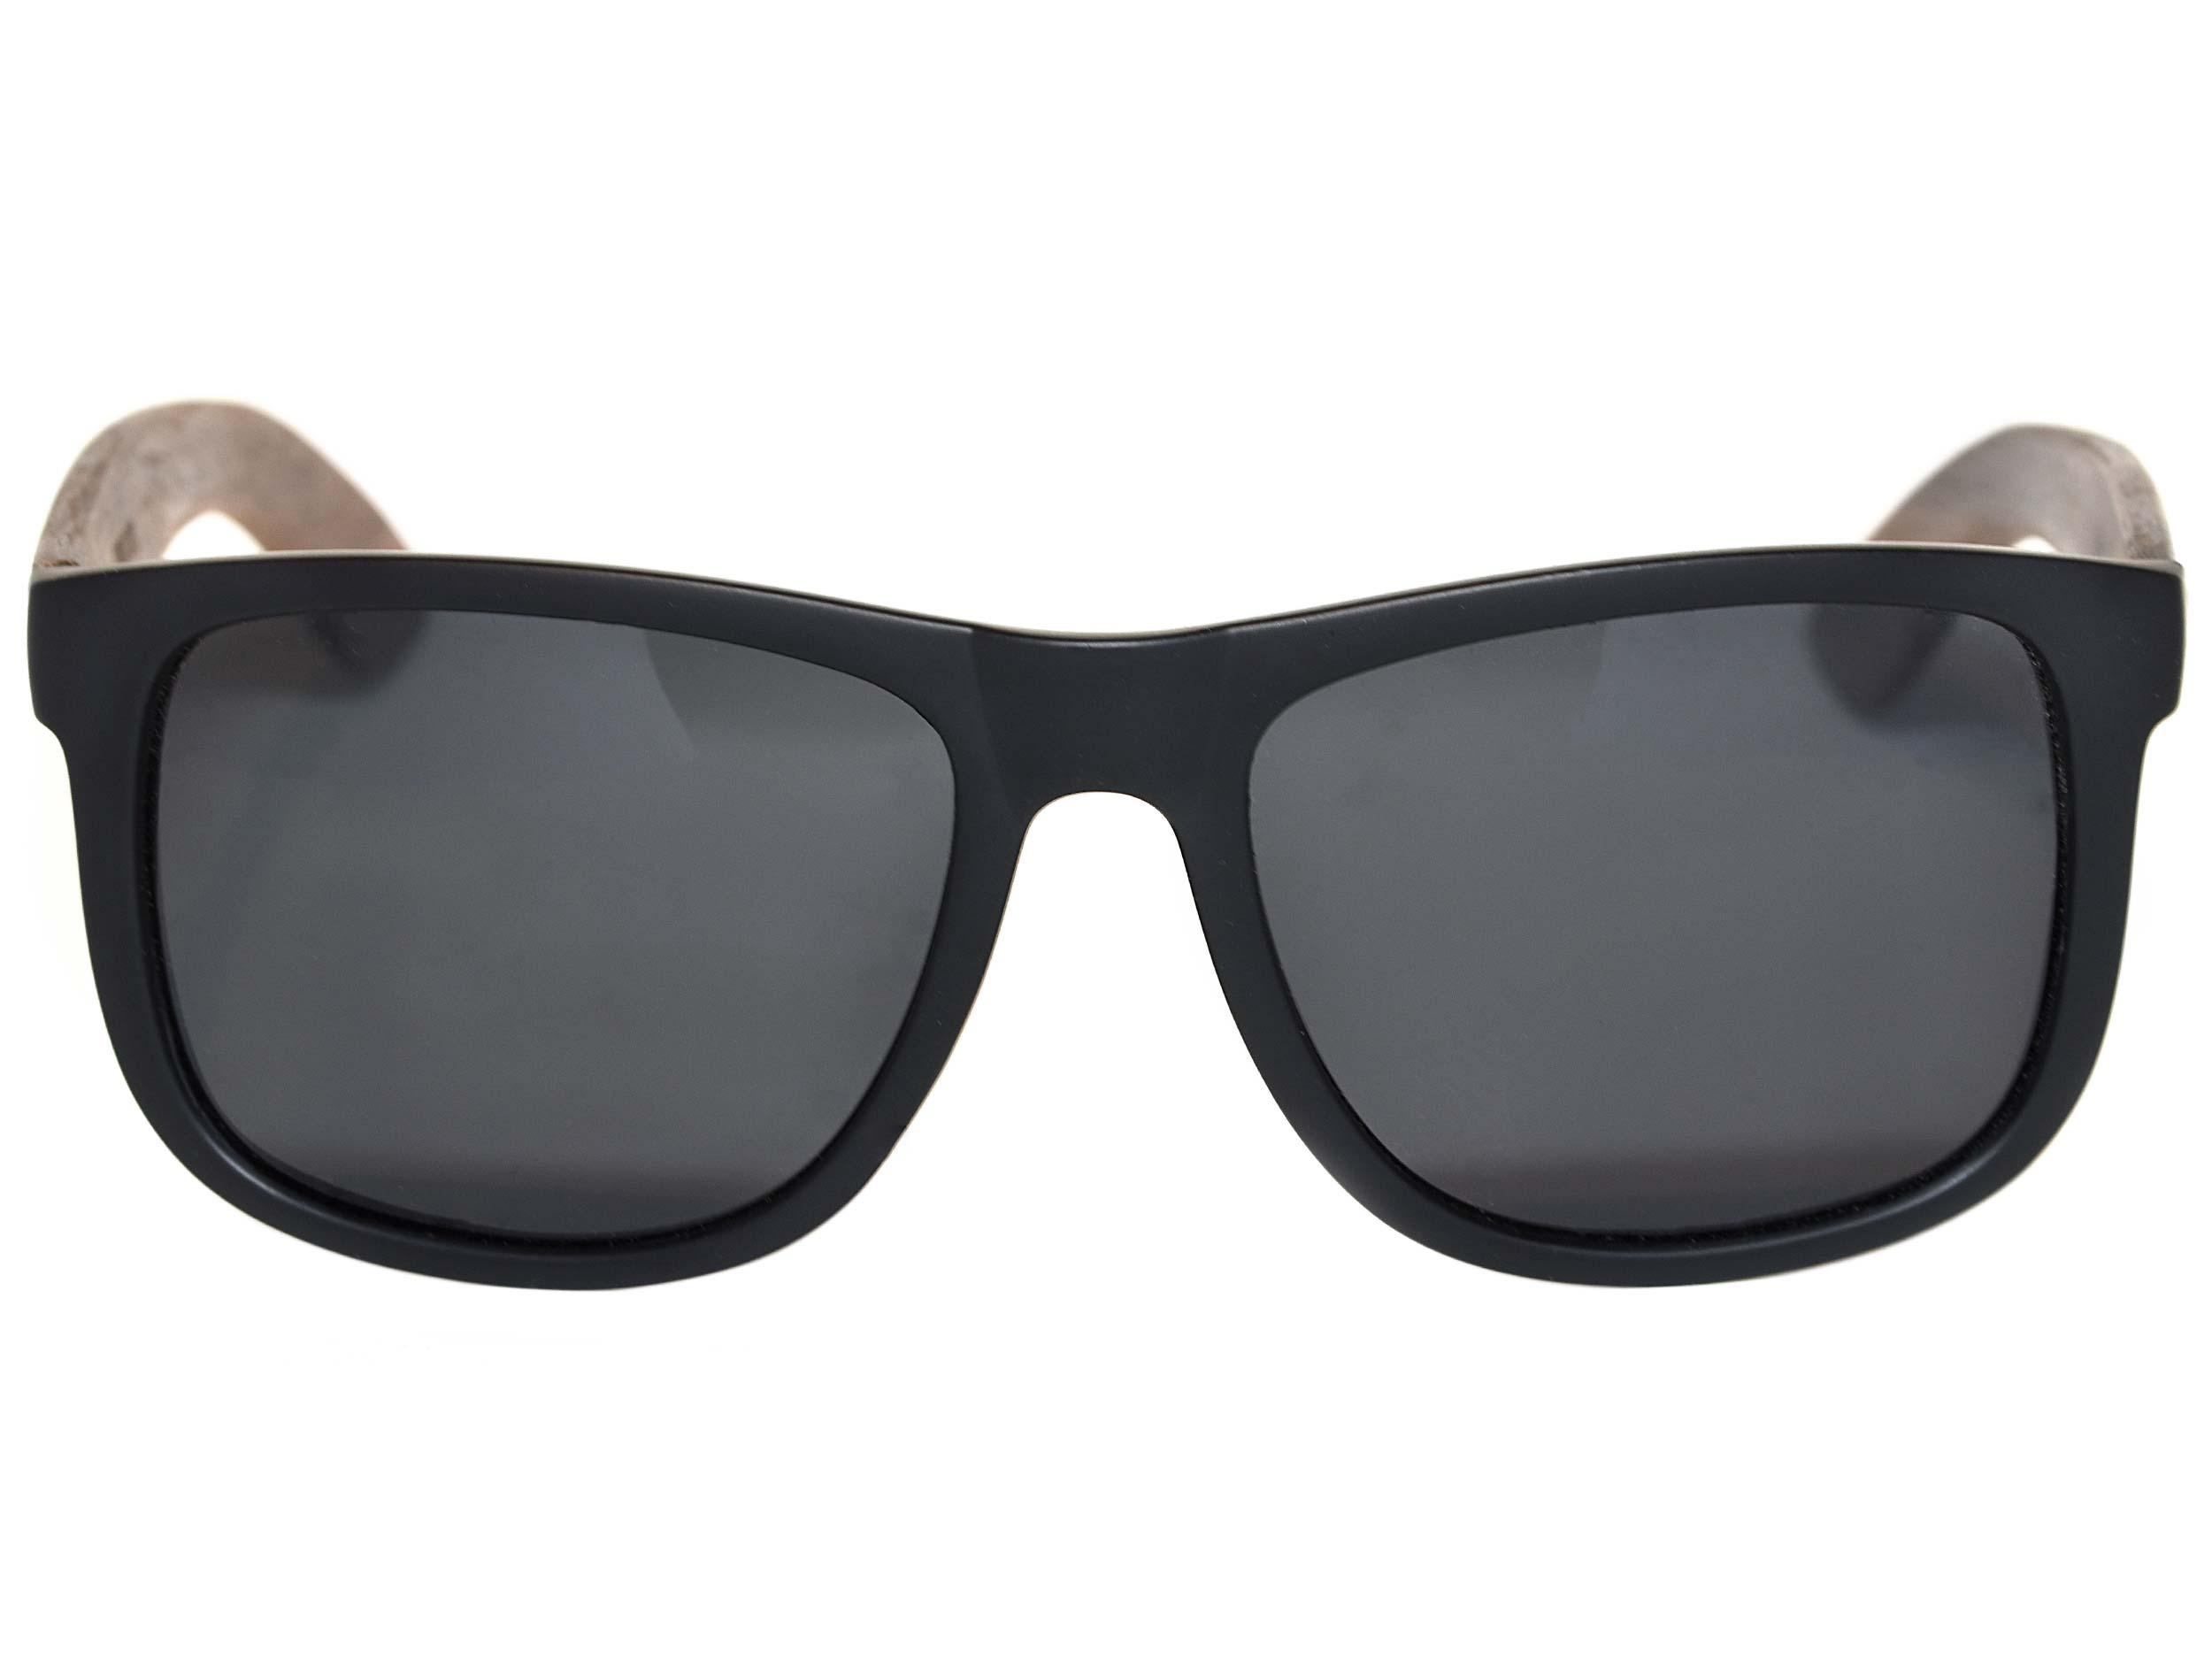 Square walnut wood sunglasses